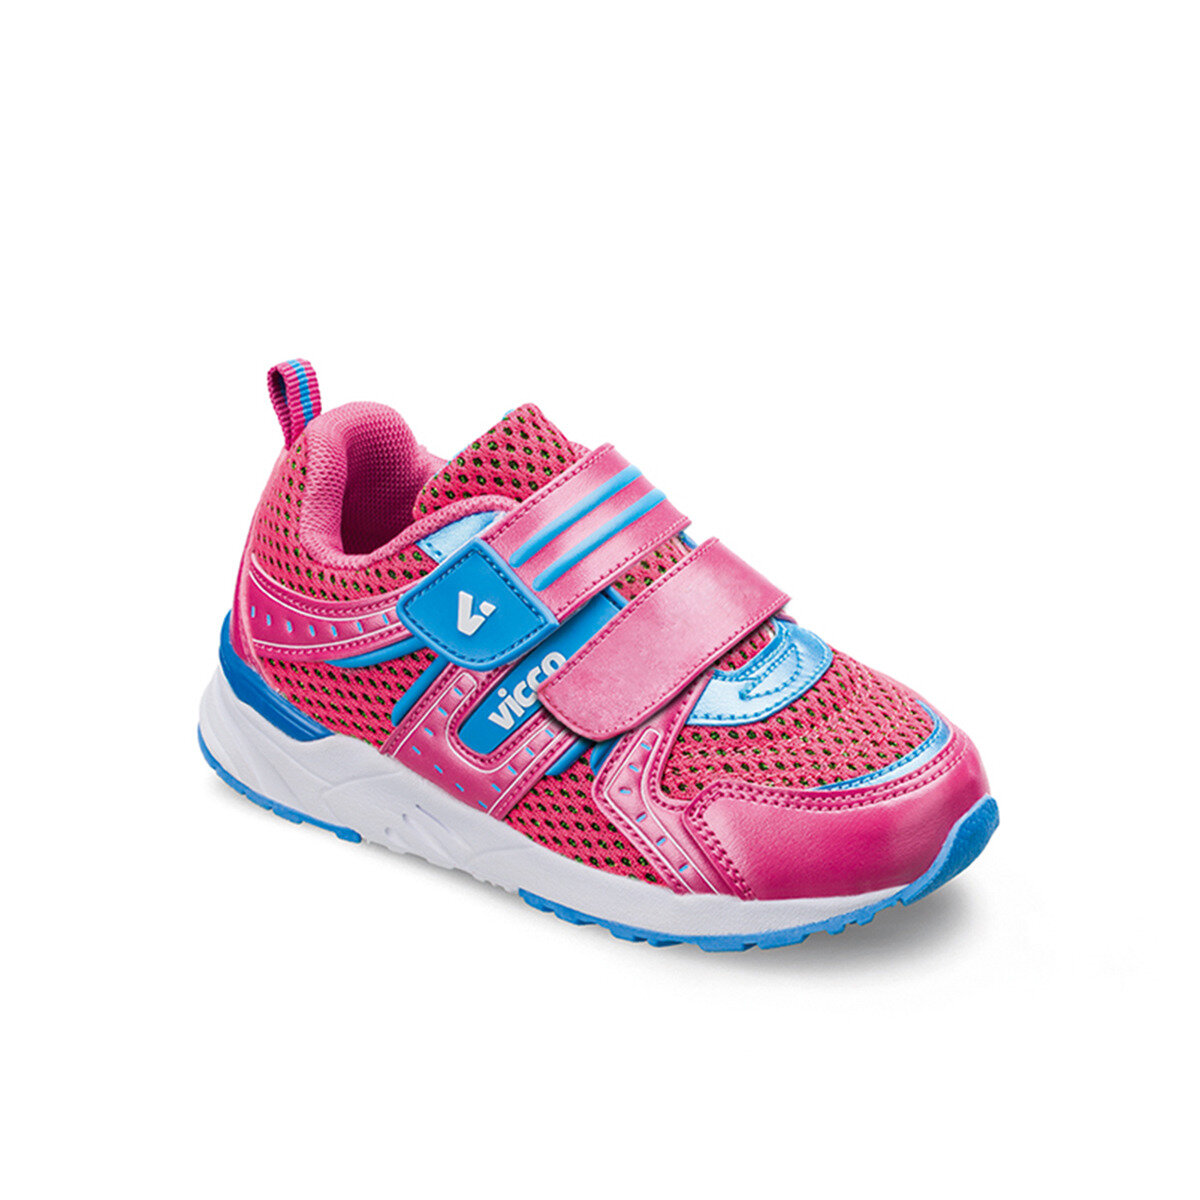 FLO 346. Z.101 BEBE SPORT FOOT Fuchsia Female Child Sneaker Shoes VICCO